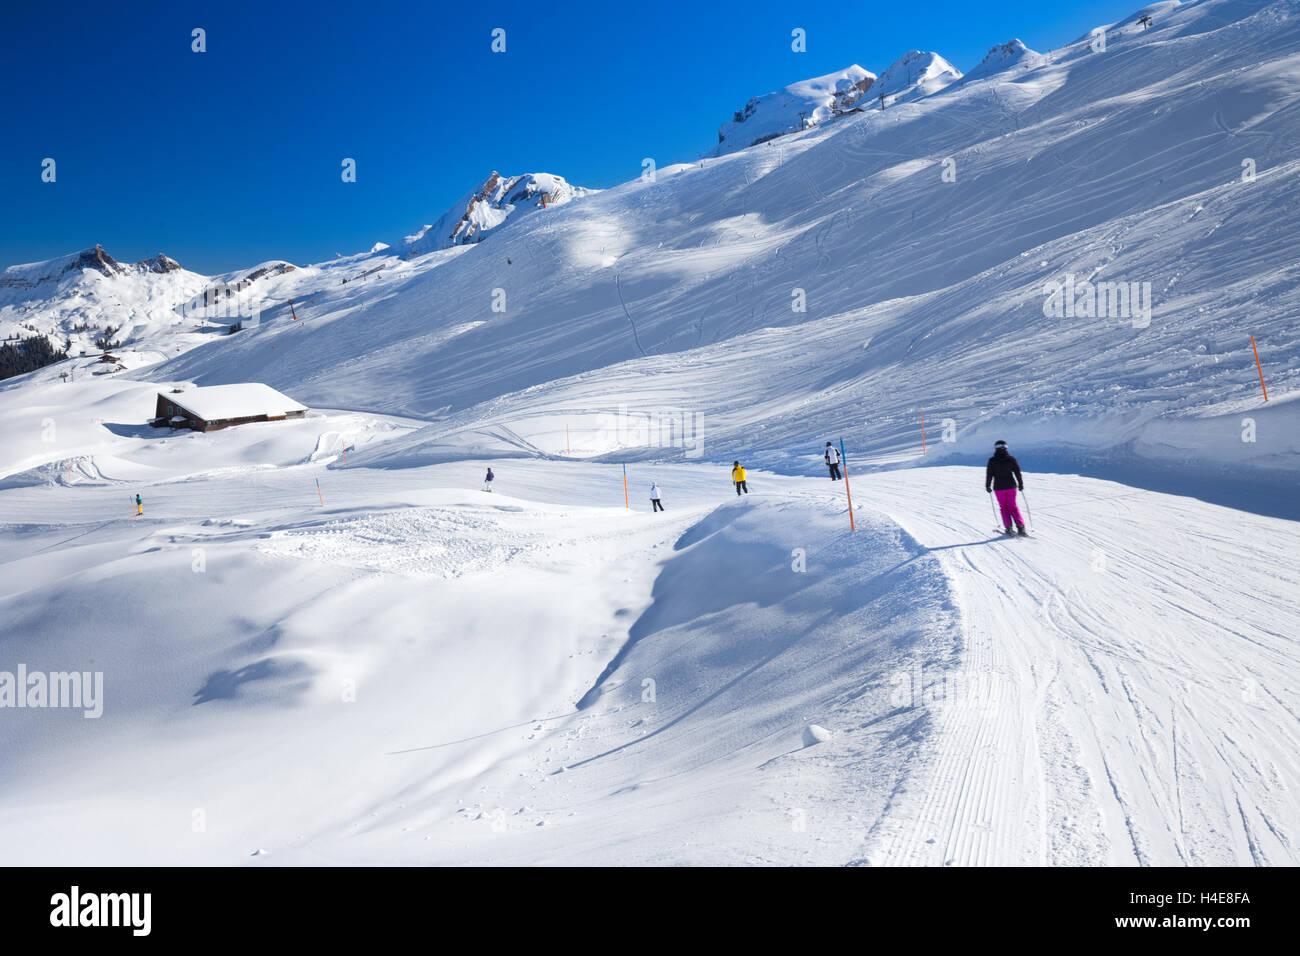 Skiers skiing on the top of the Hoch-Ybrig ski resort, Switzerland - Stock Image